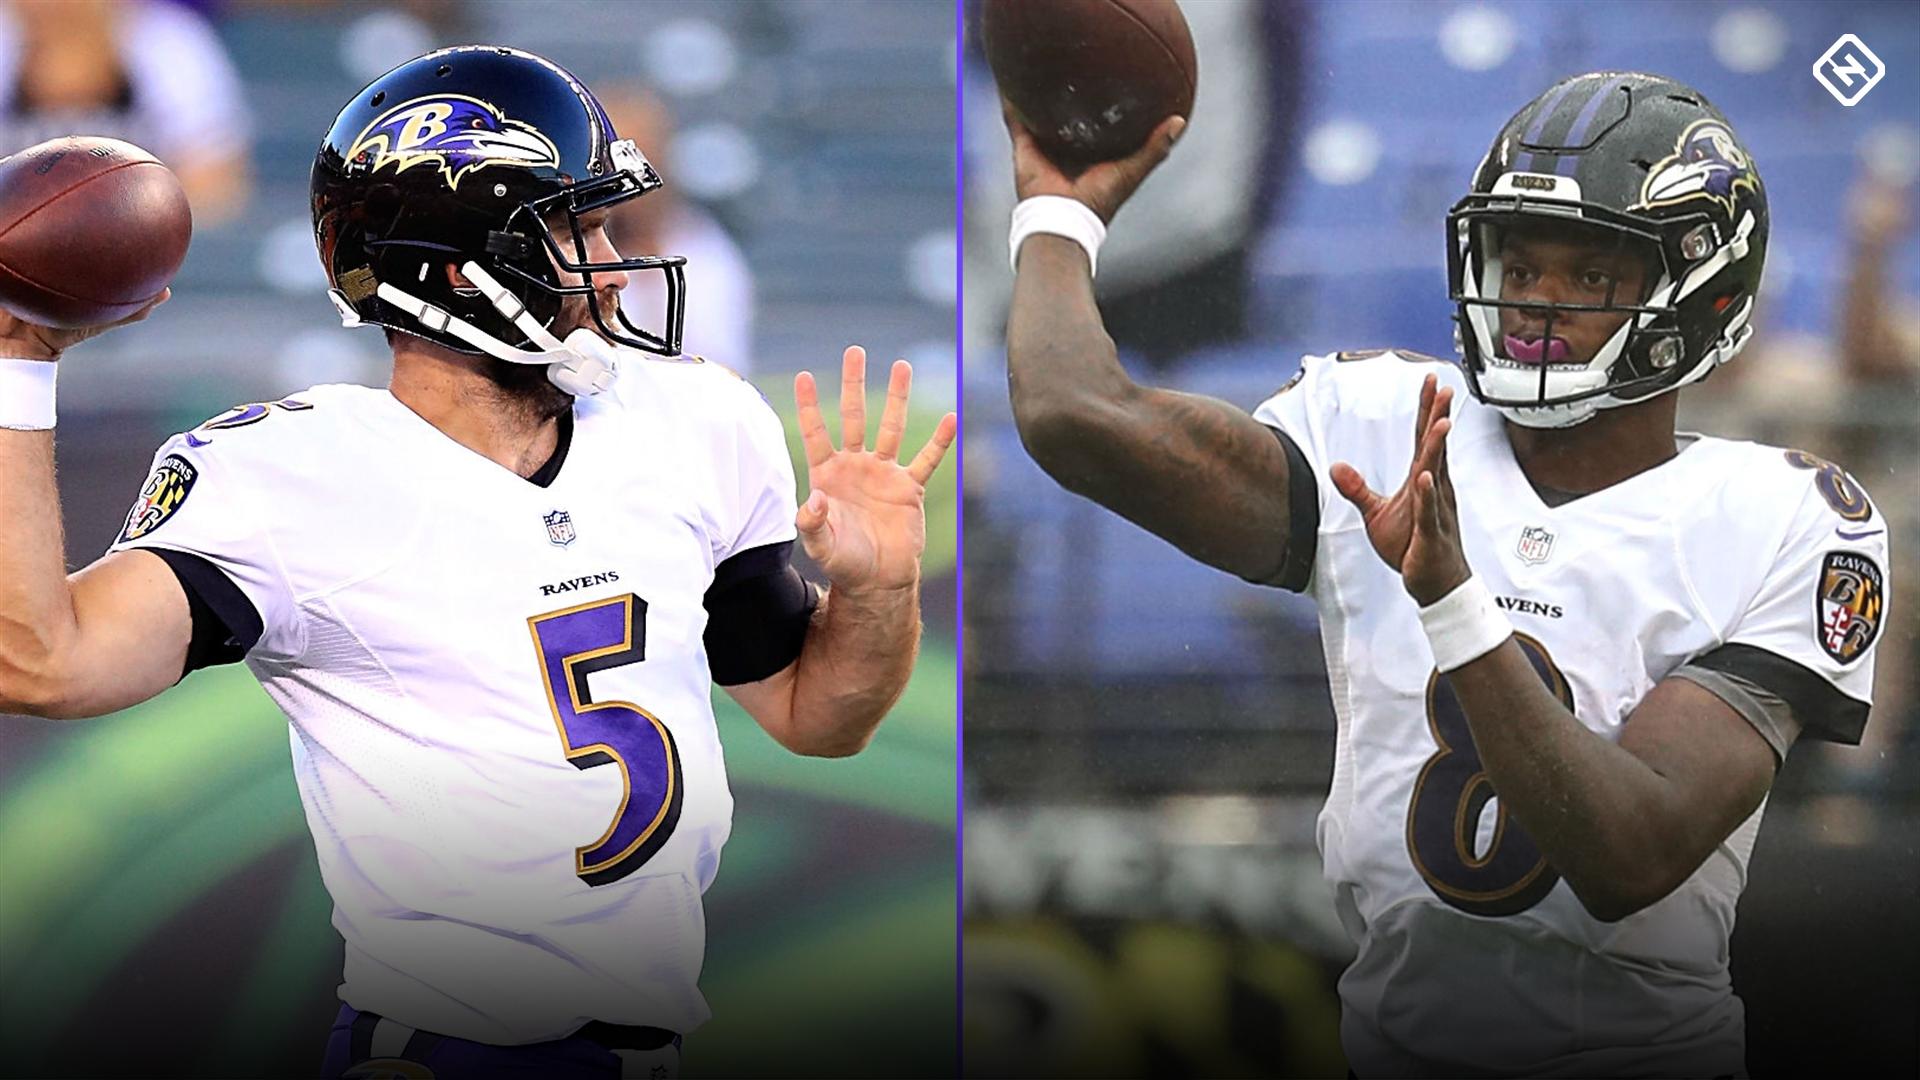 No, Ravens shouldn't play Lamar Jackson over Joe Flacco — for now, anyway